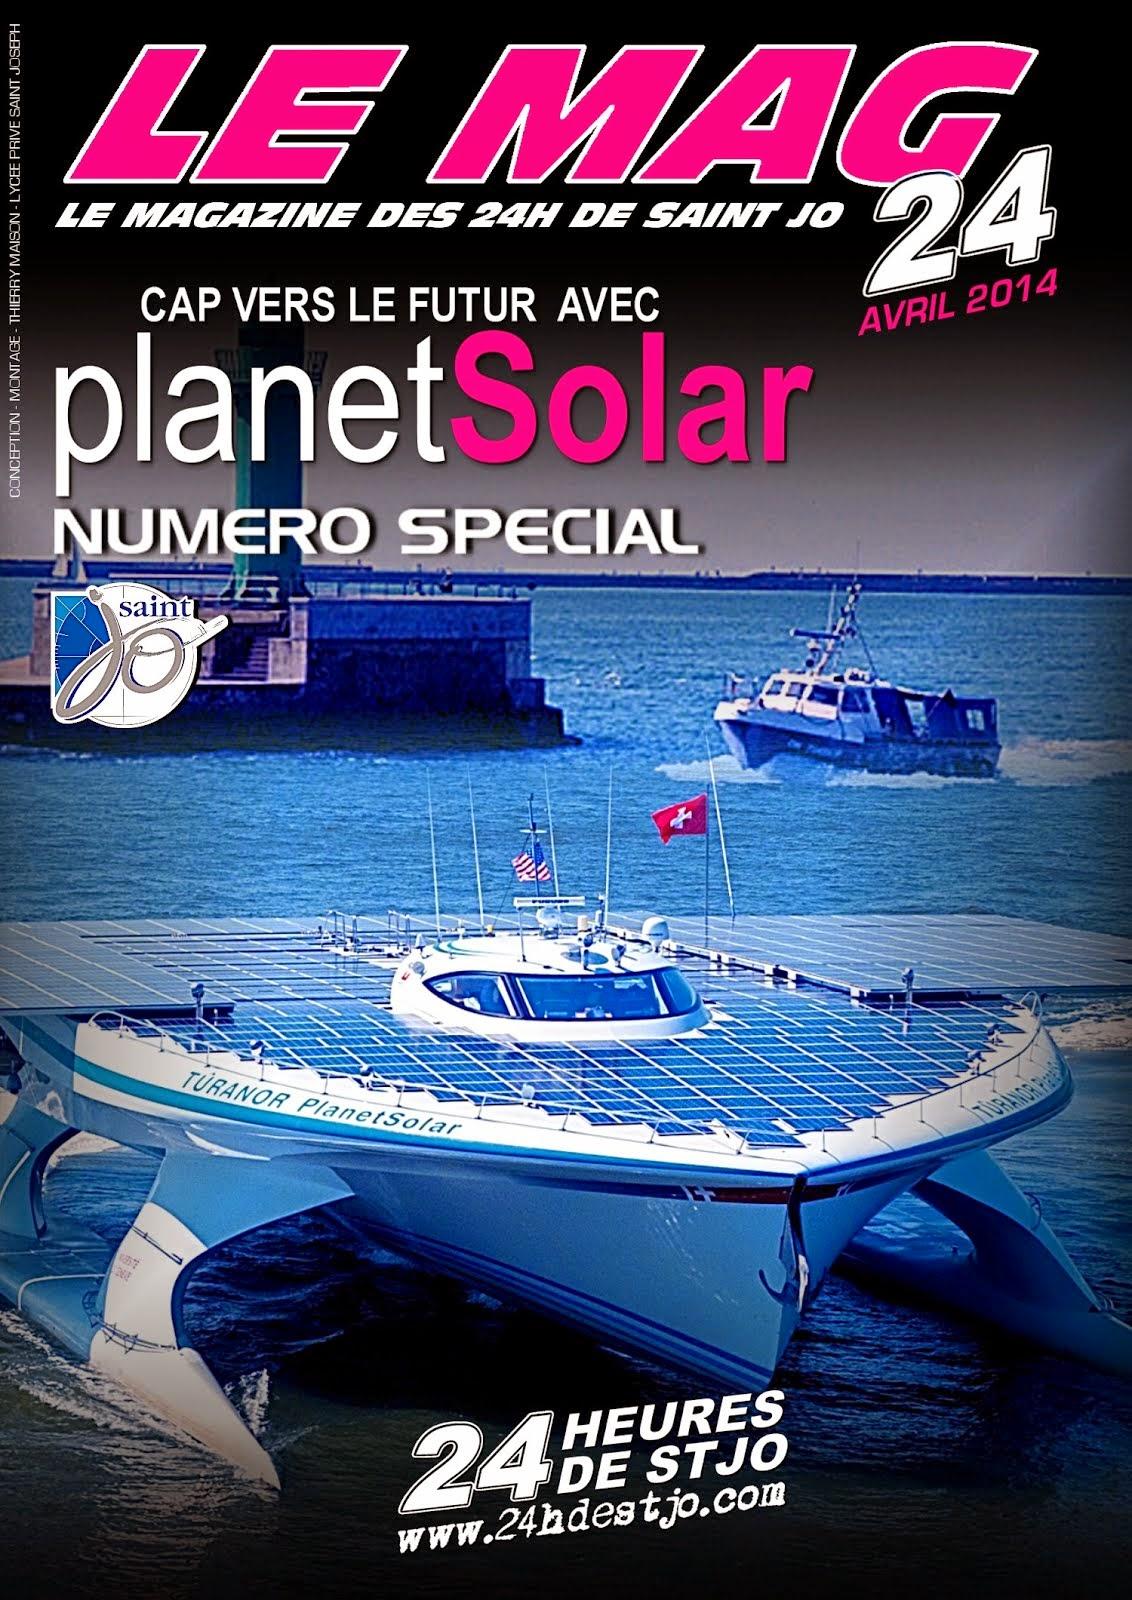 MAG24 - NUMERO SPECIAL PLANETSOLAR